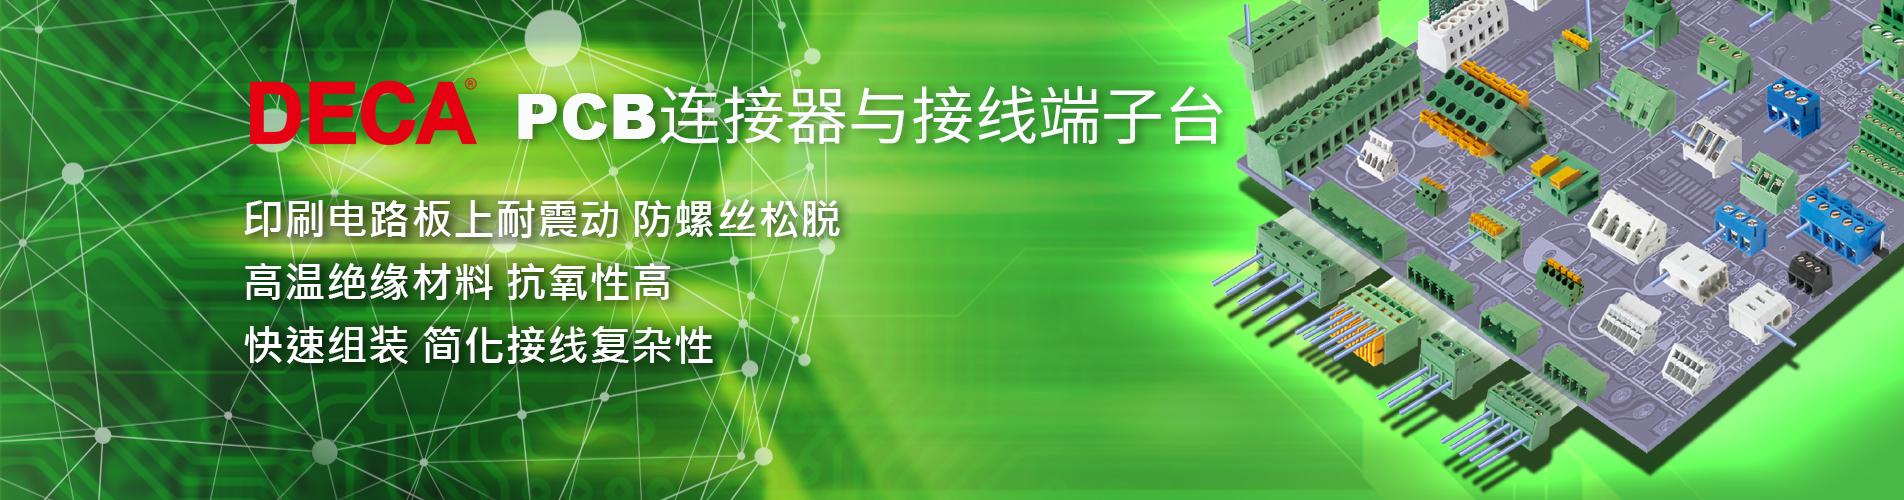 20210330_banner